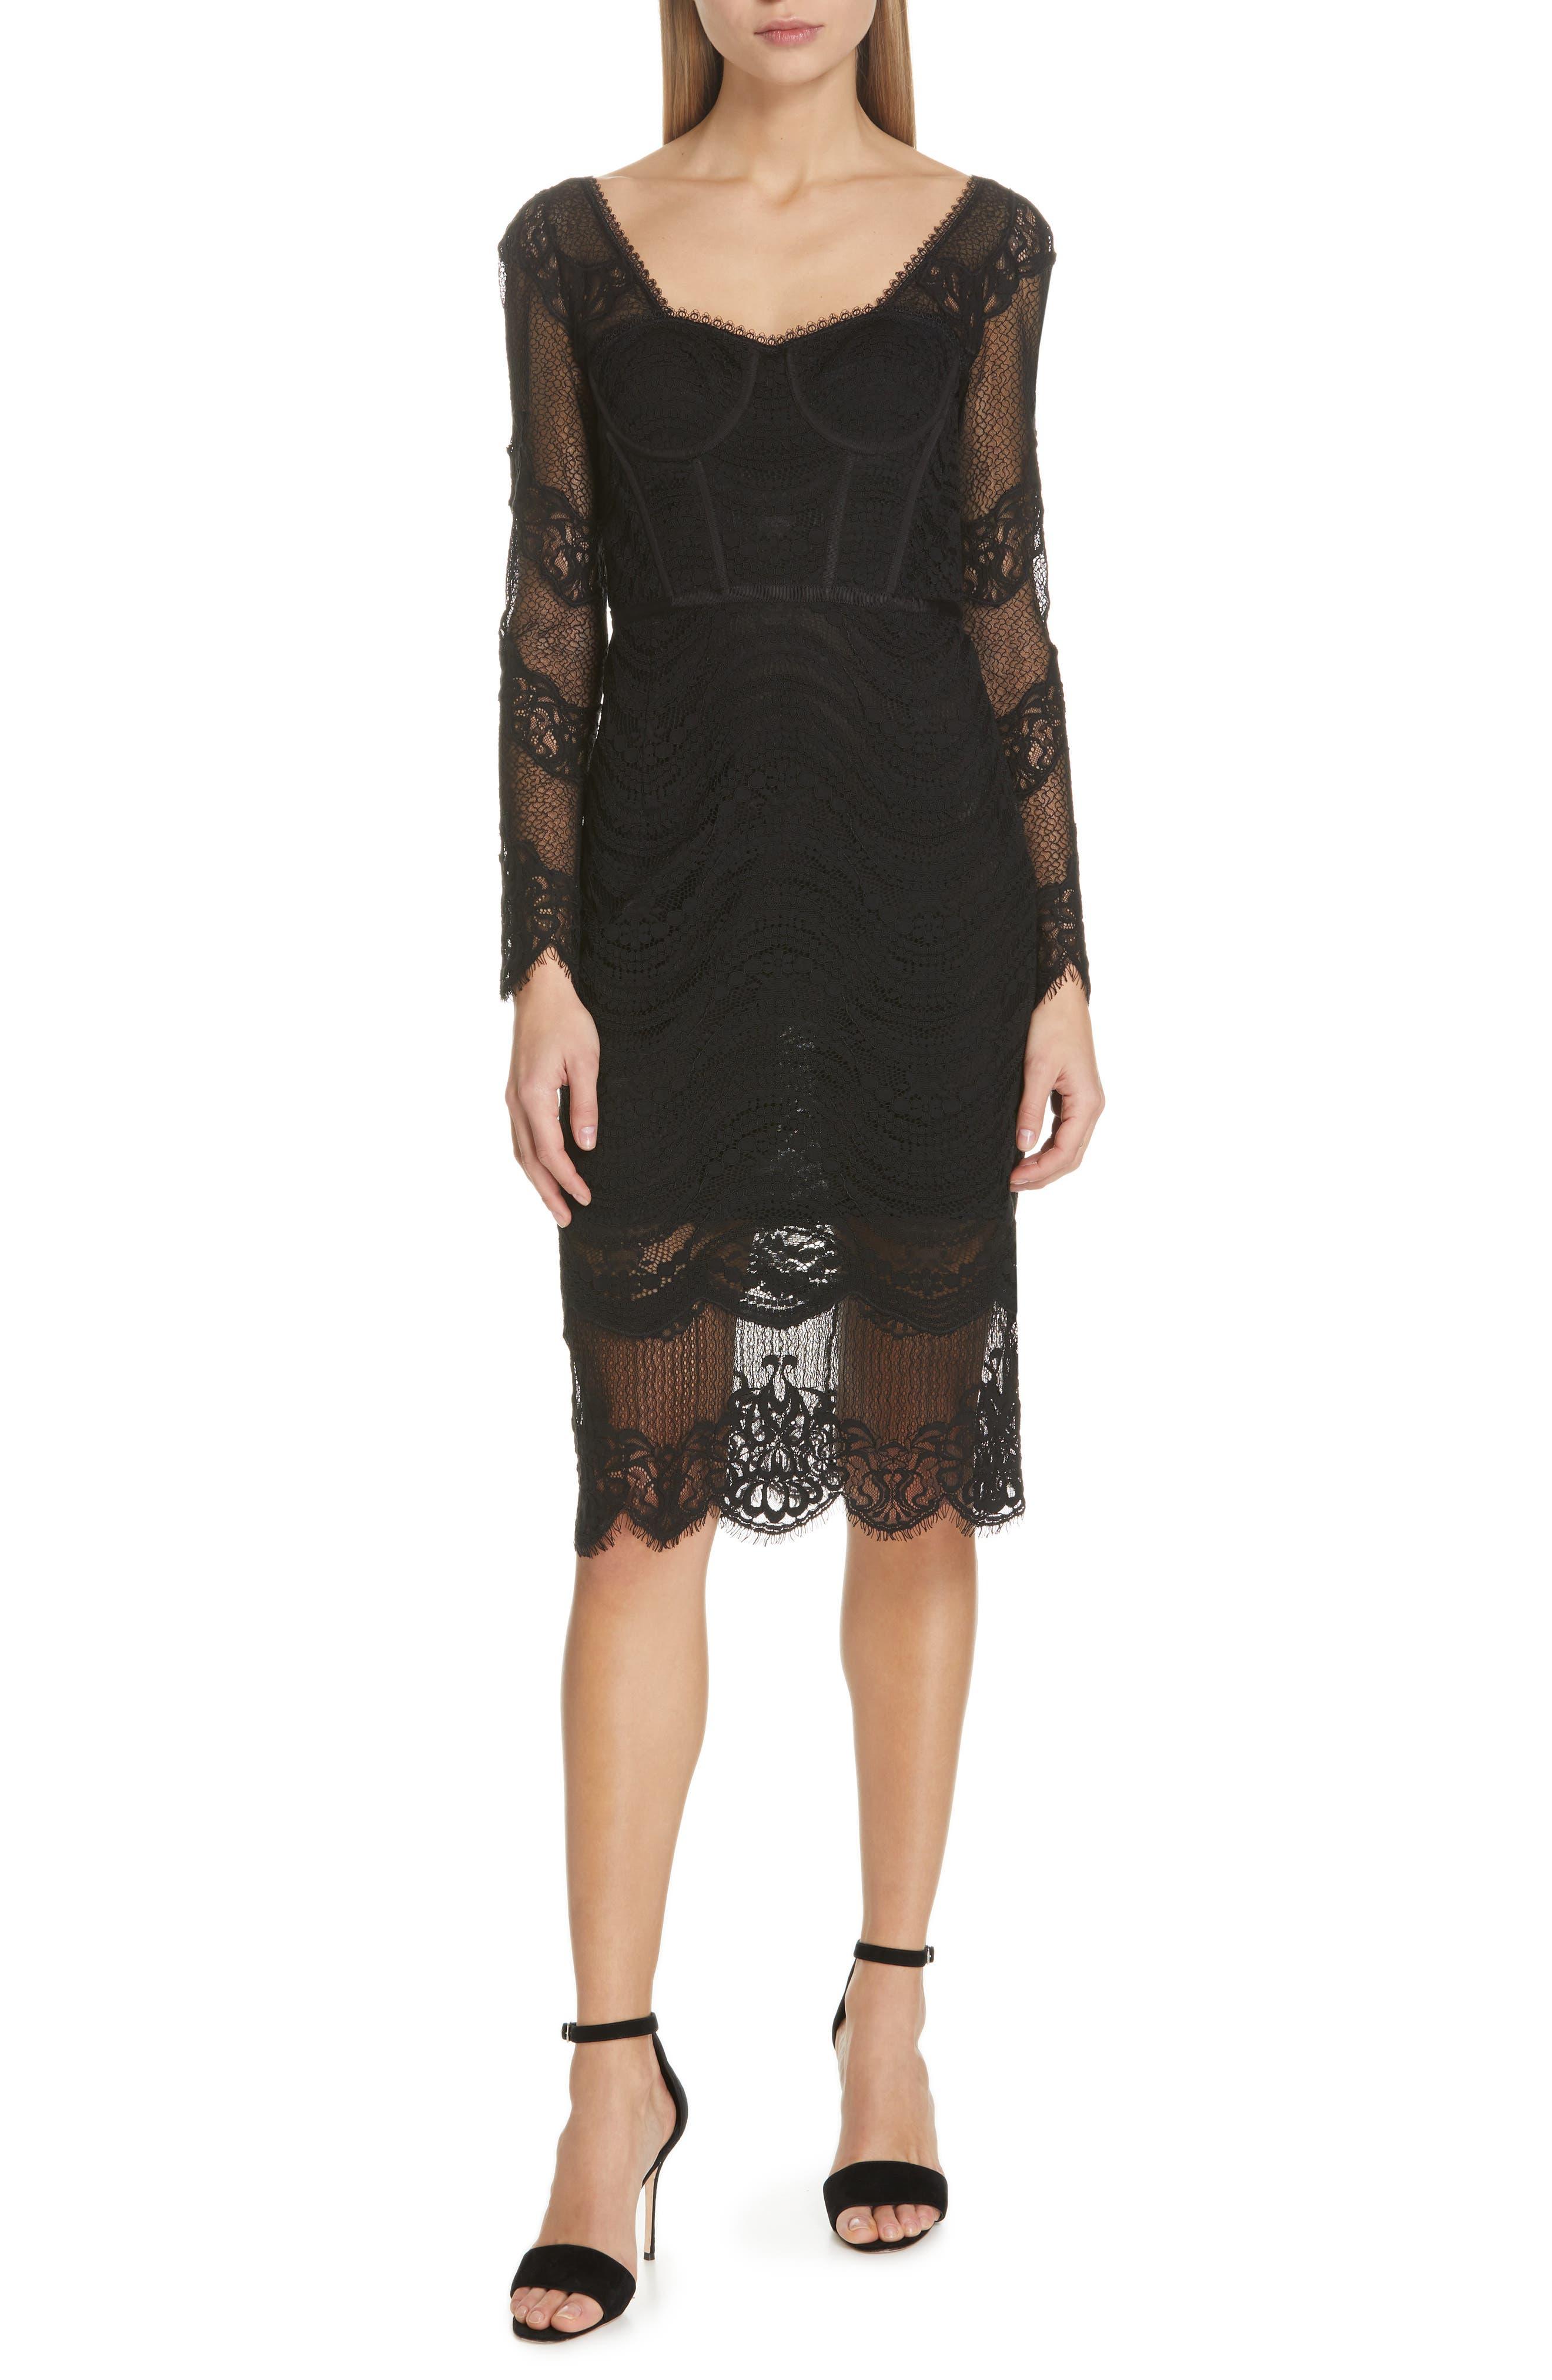 Jonathan Simkhai Lace Bustier Bodysuit Dress, Black